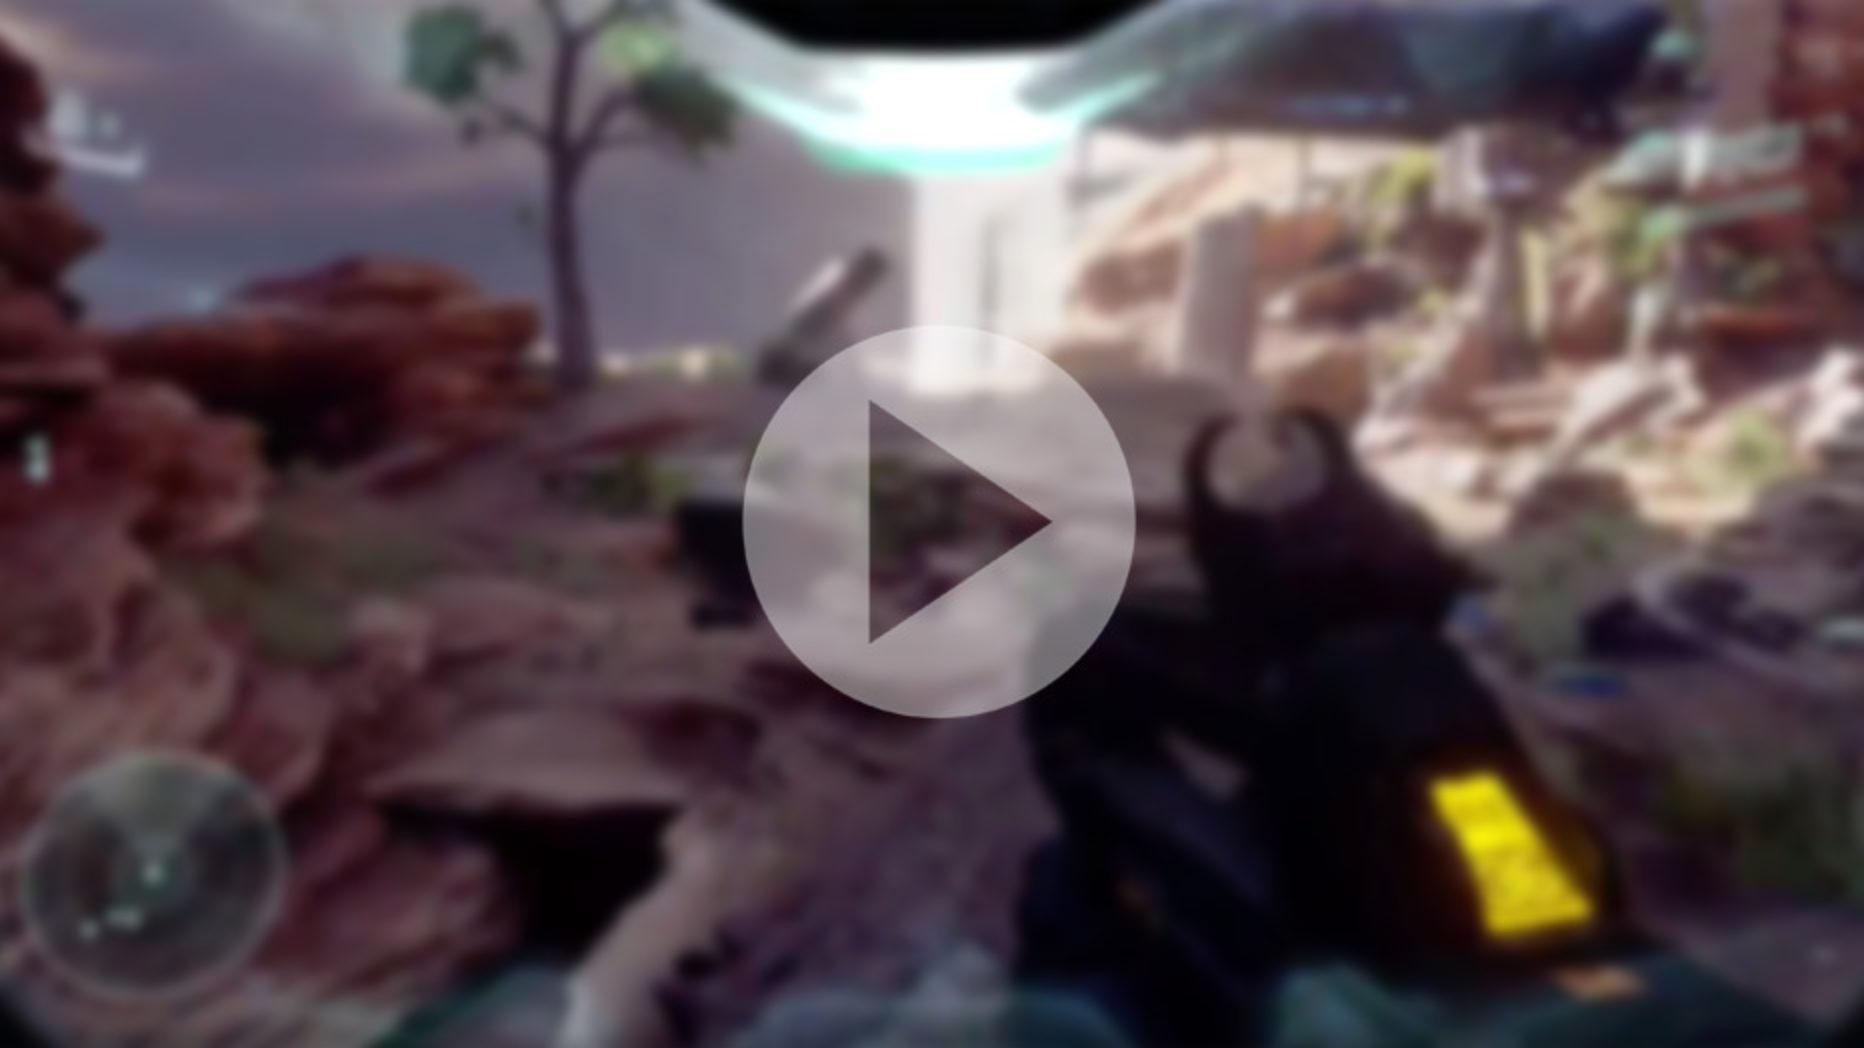 Sneak Peak: Halo 5 Late Campaign Gameplay